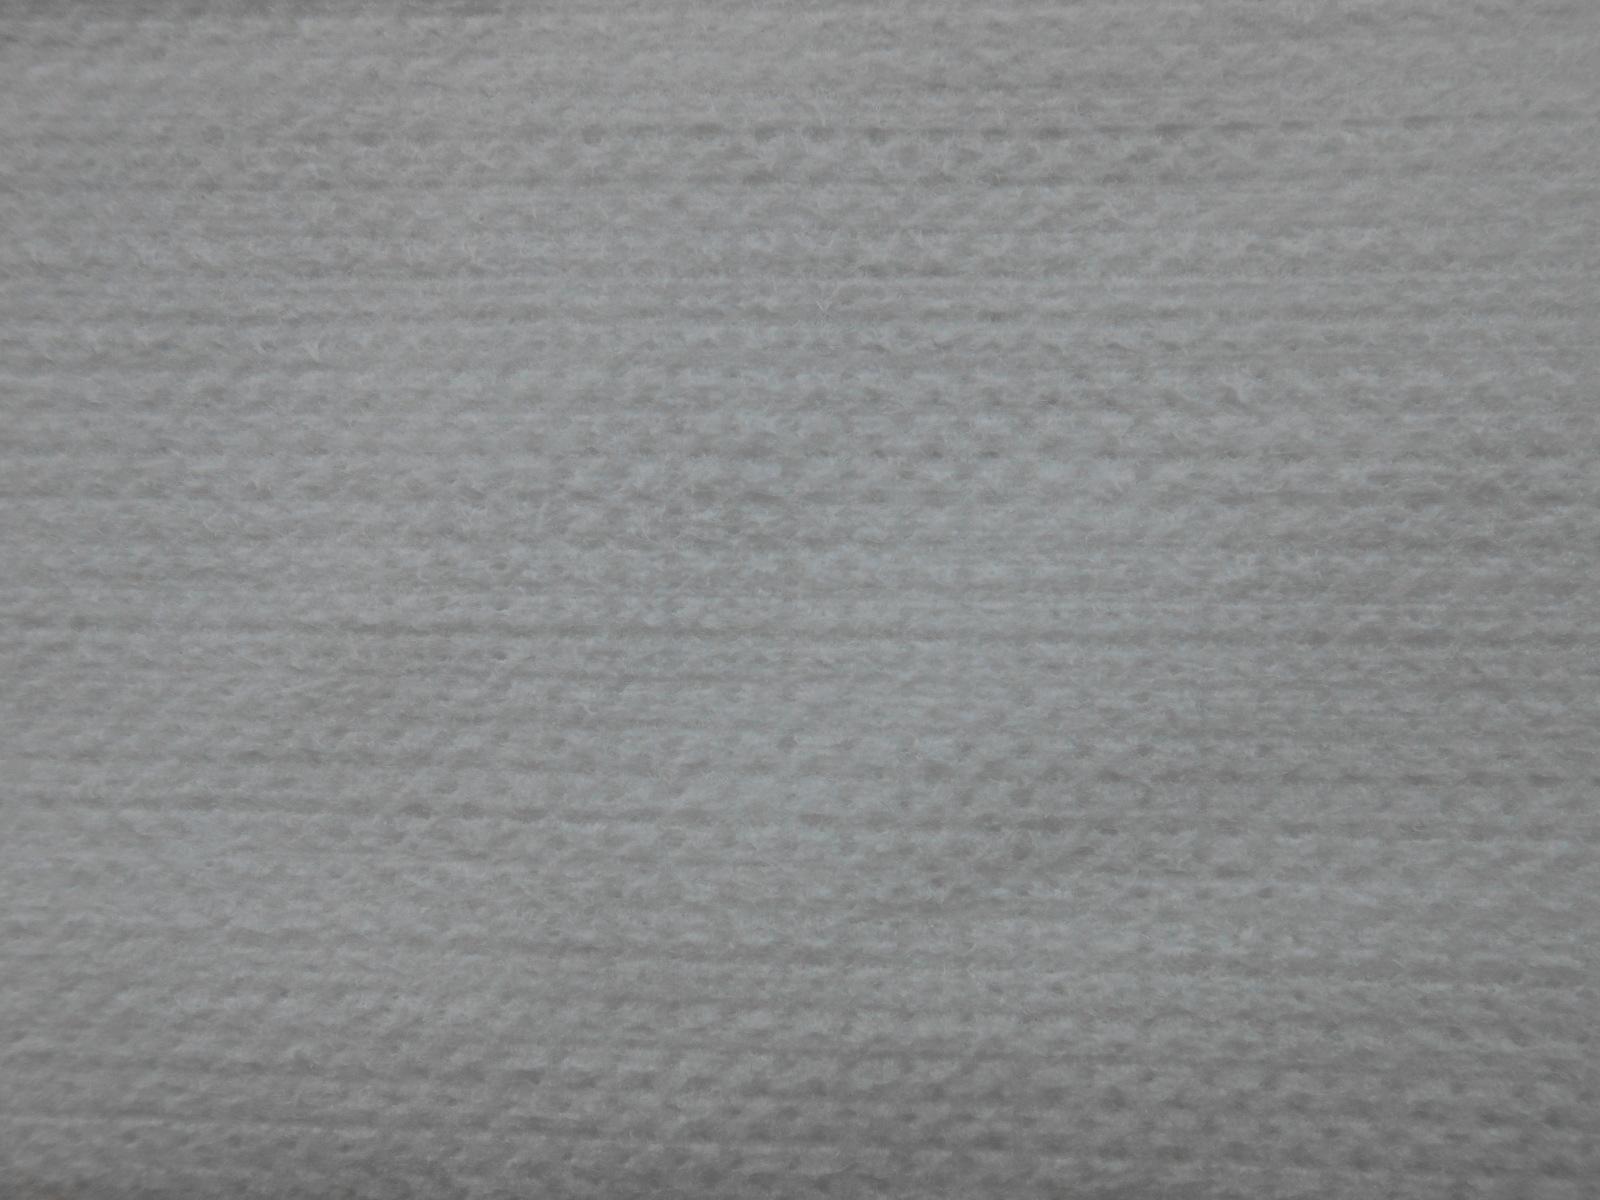 SOFTEXTRA whiteperf.roll 38x40cm- 1x950s